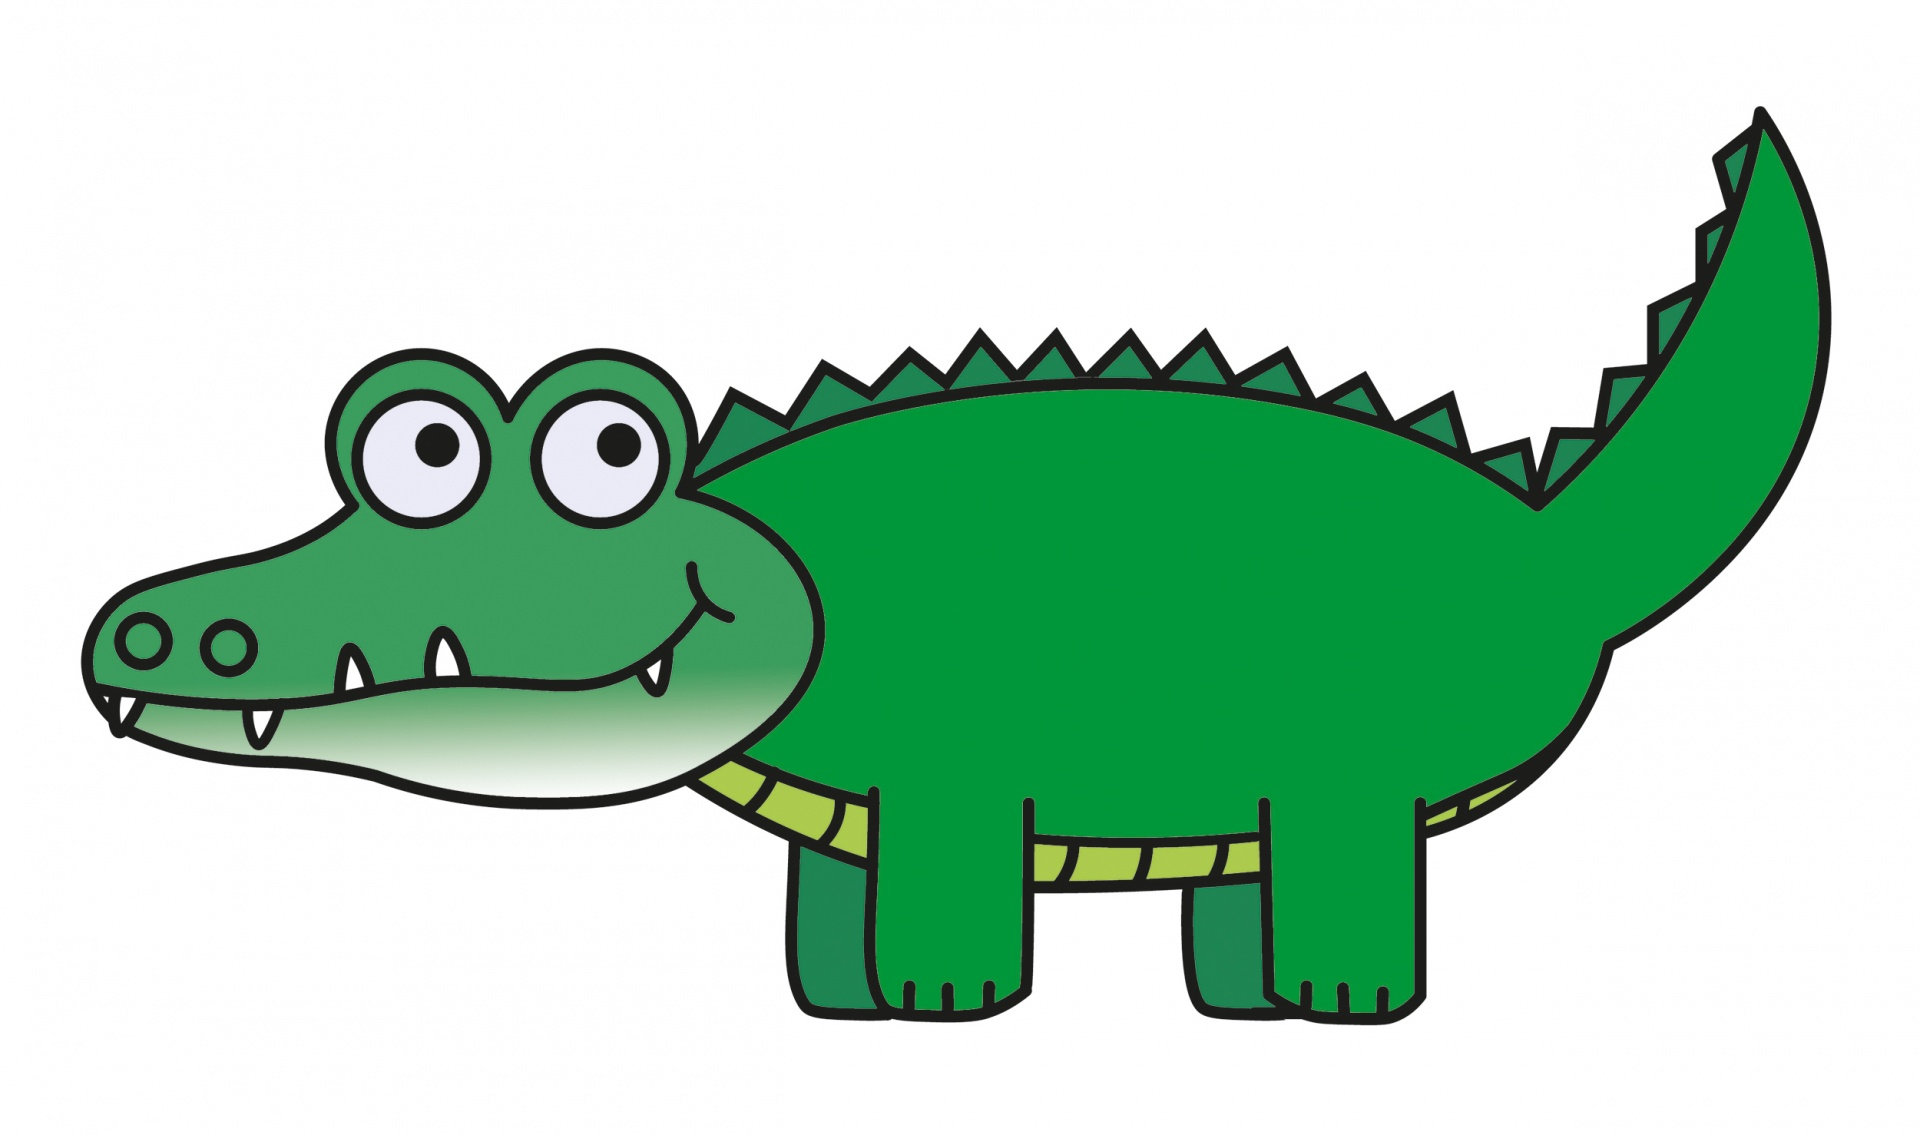 Alligator,cartoon,cartoon alligator,alligator clip art,crocodile.